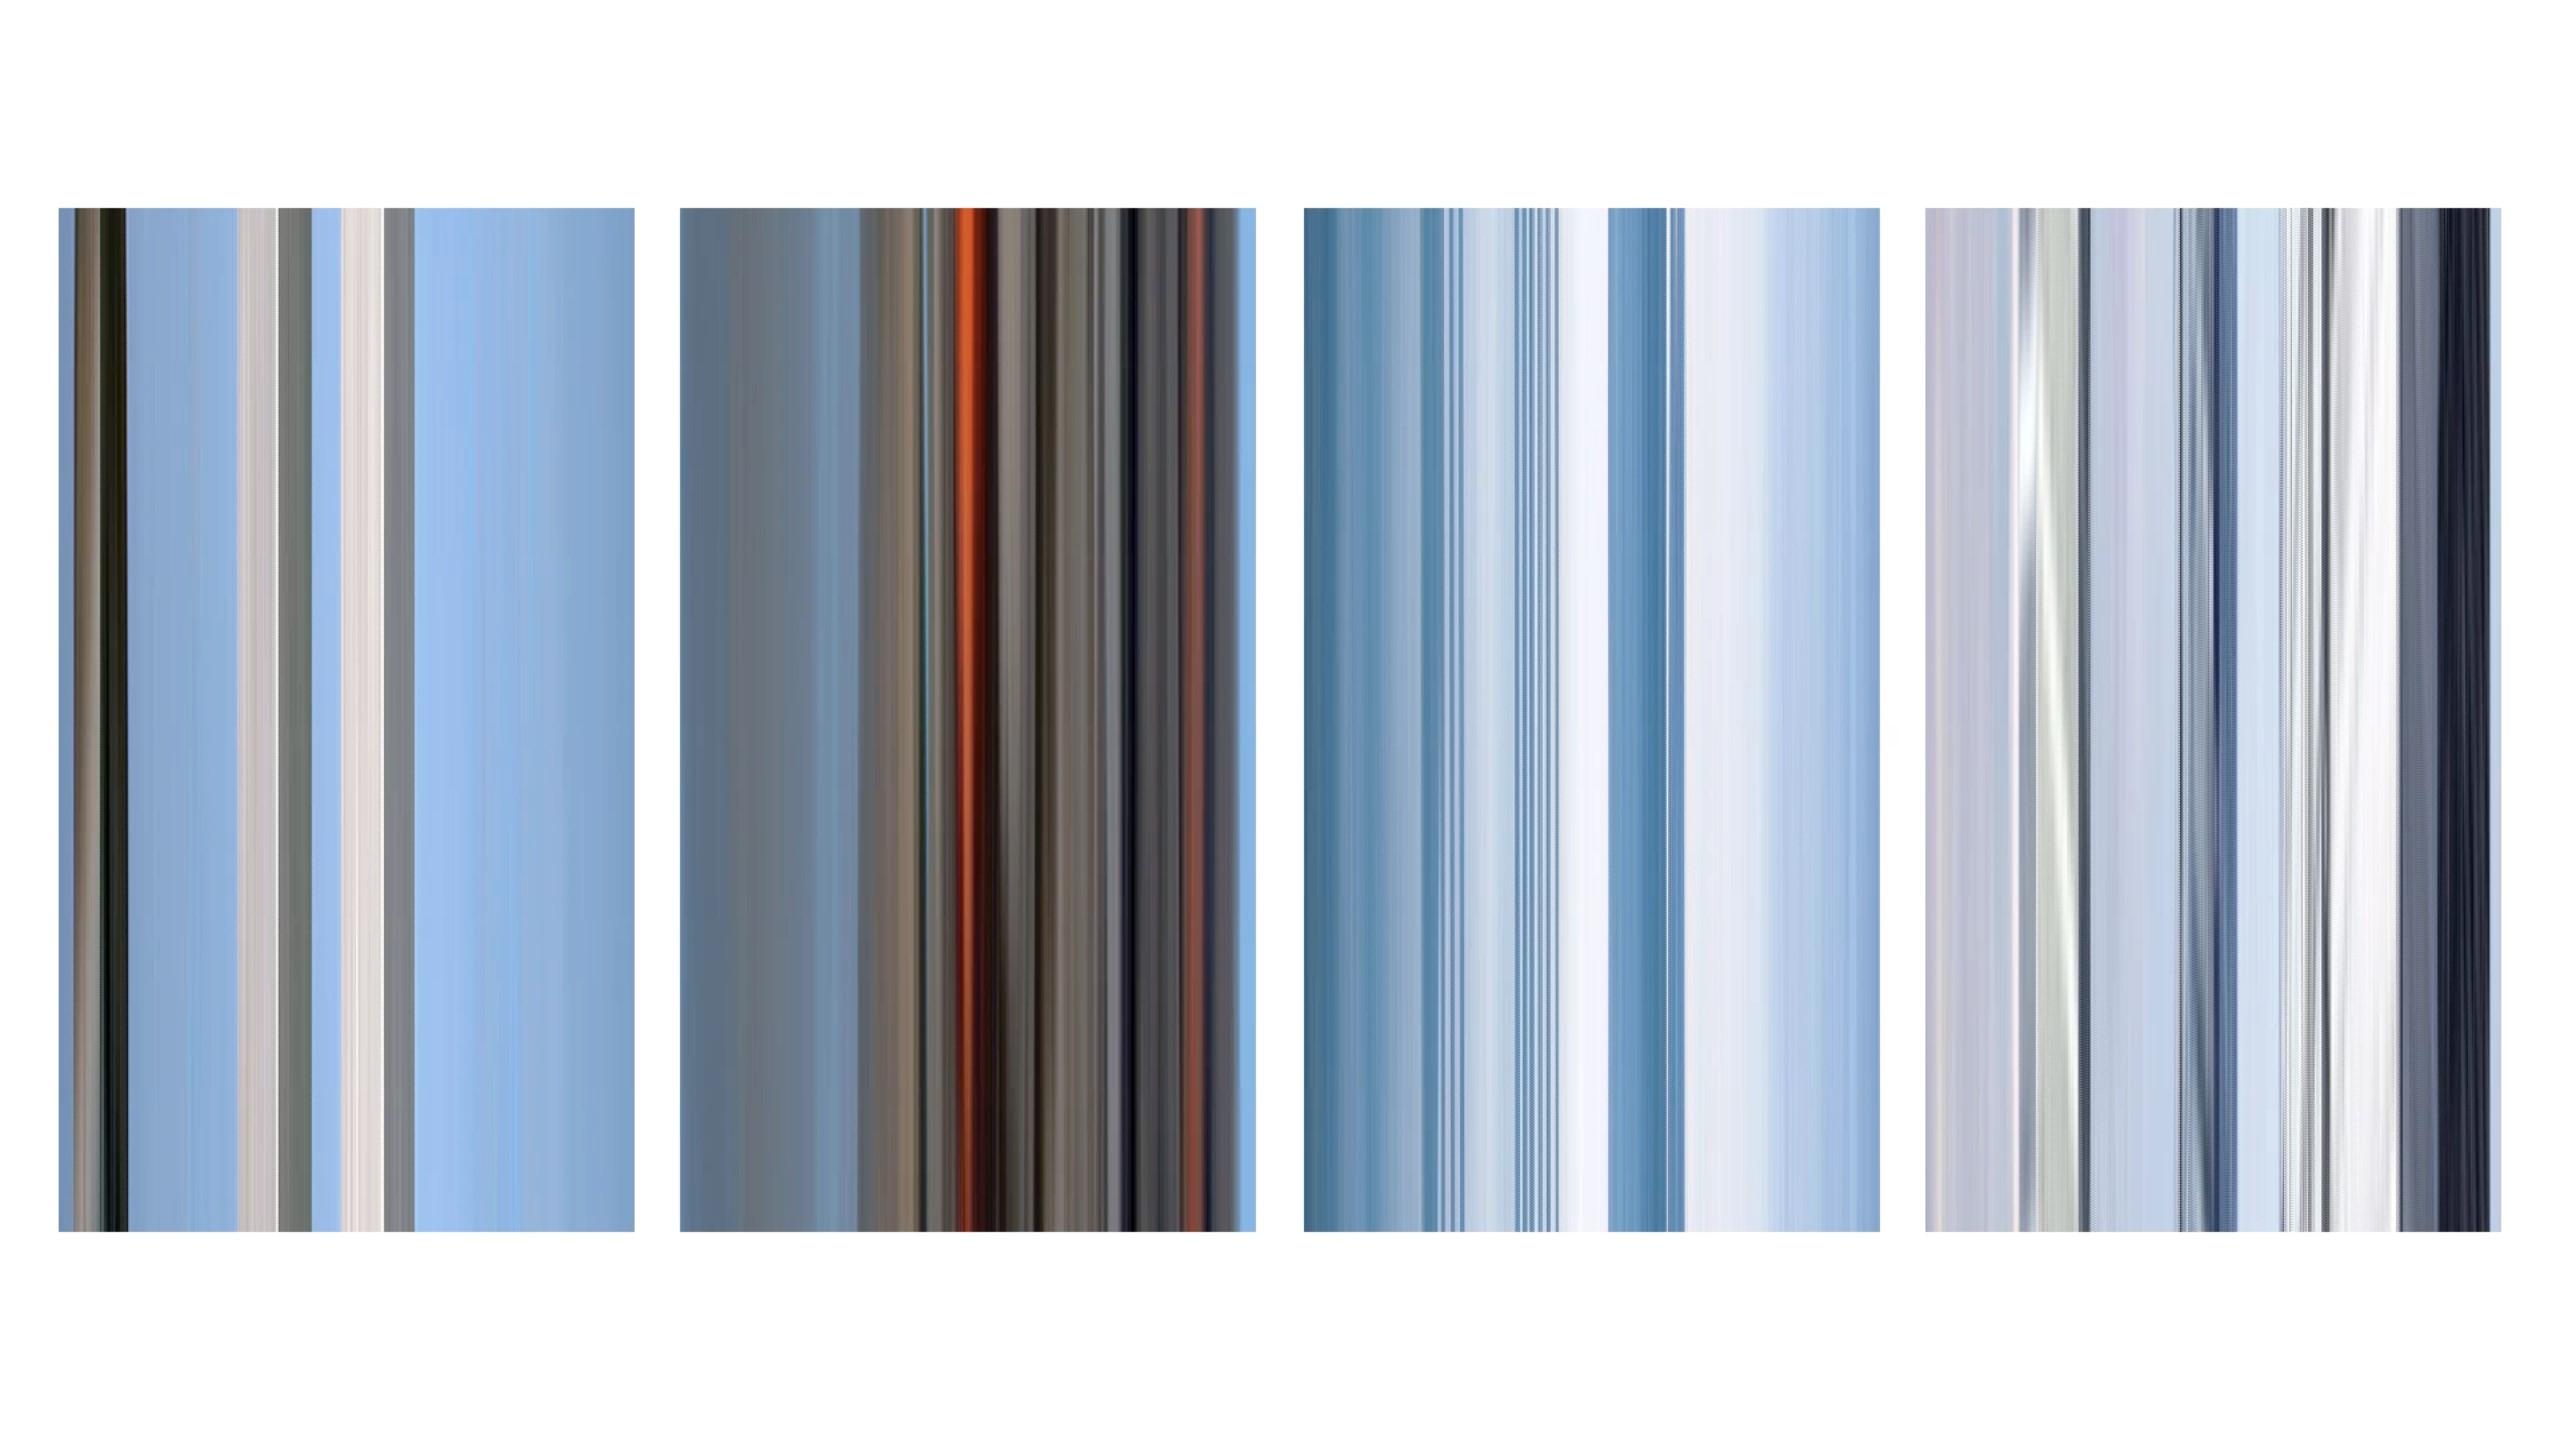 2014-06-02-WTCin4momentsscreencapture3minutes2.jpg